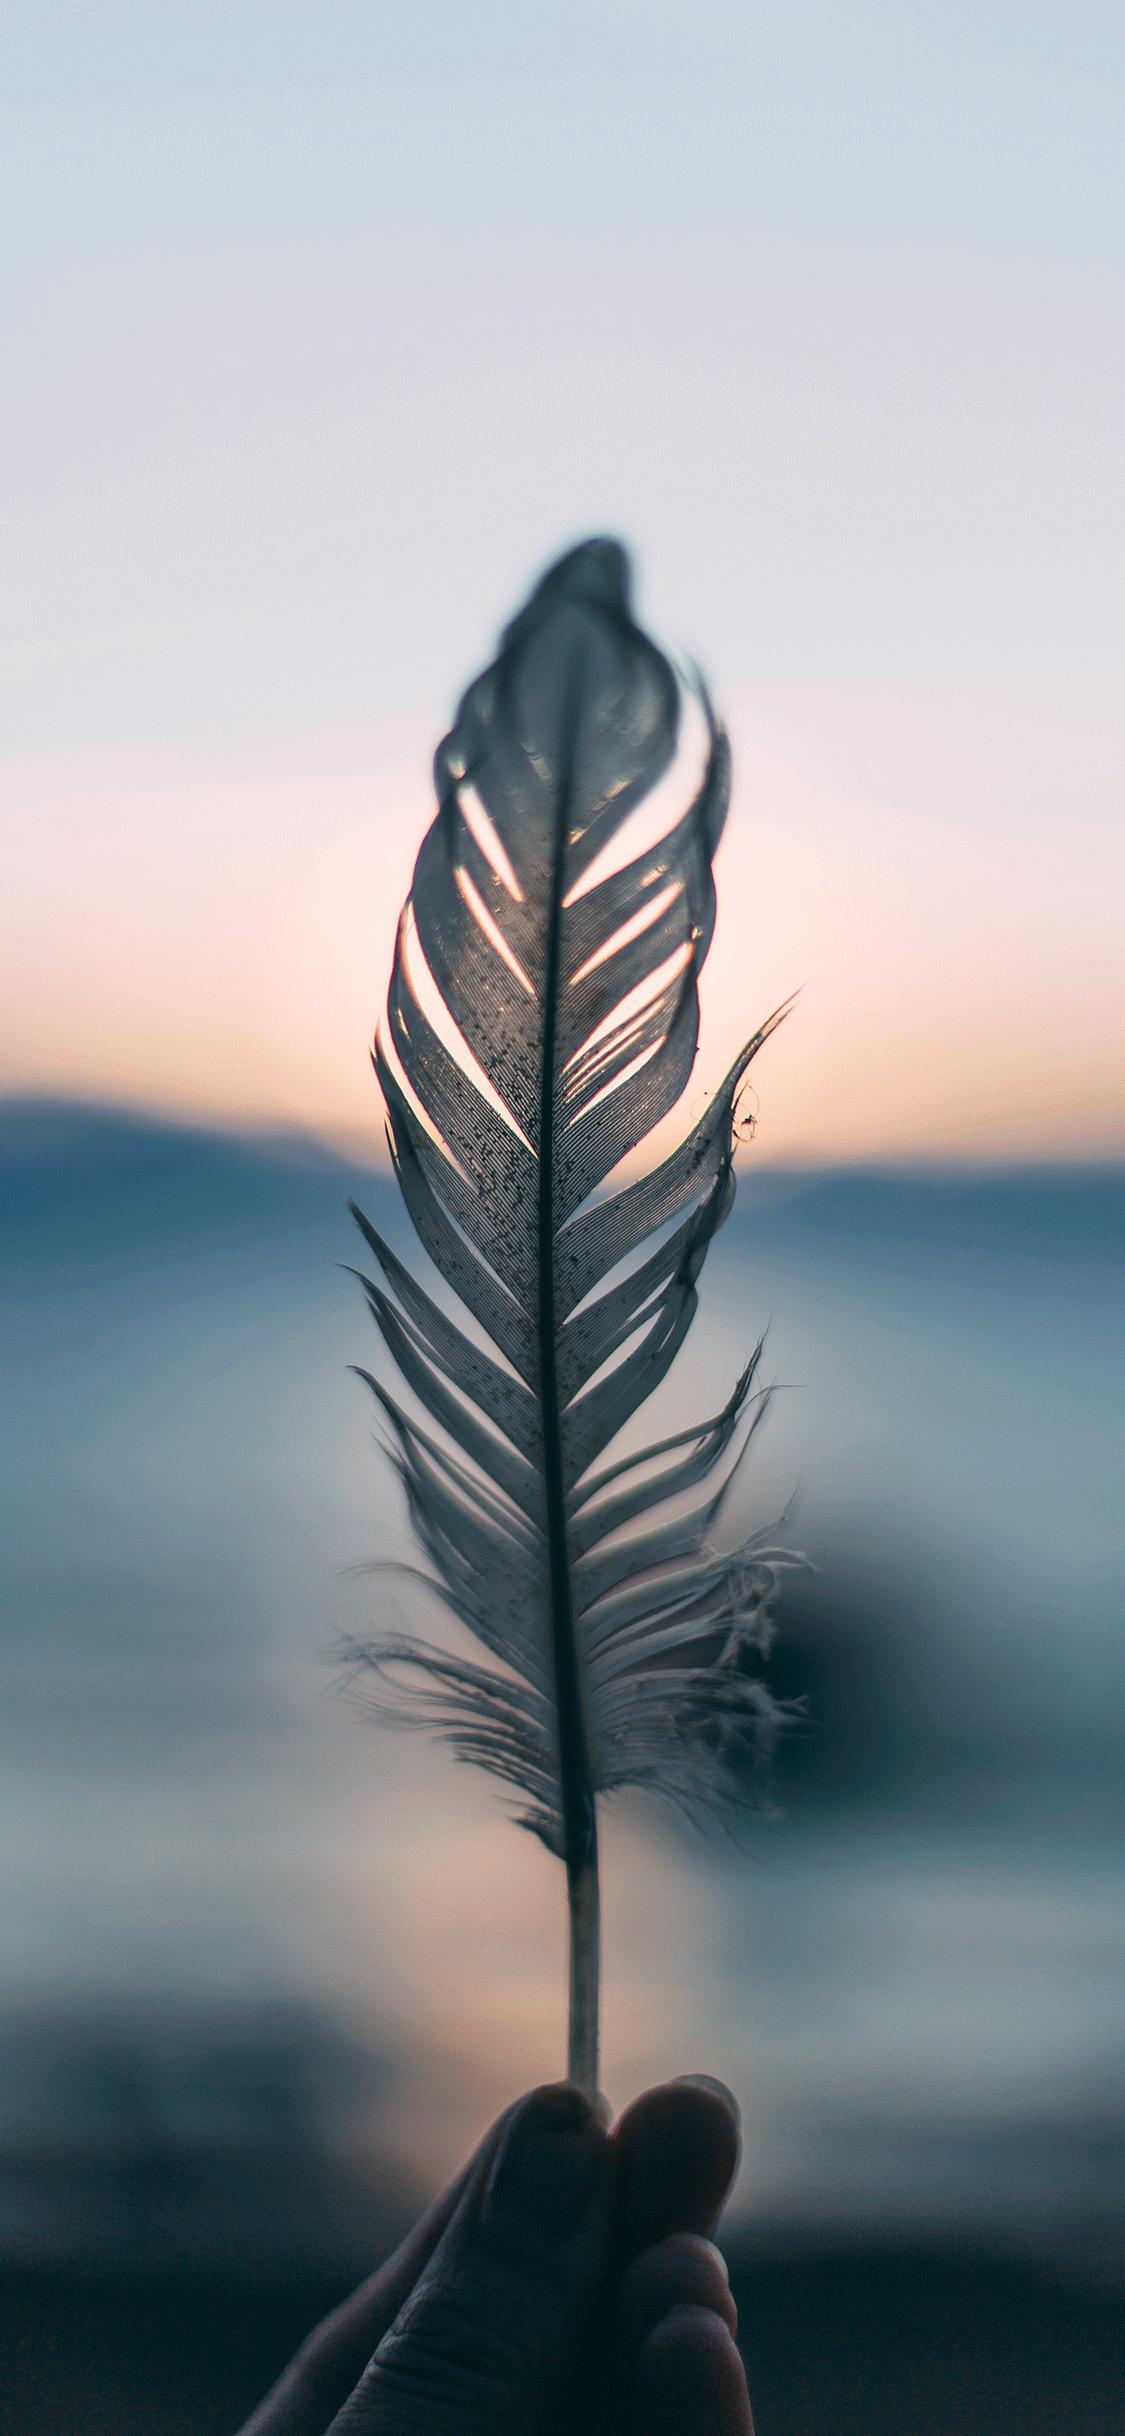 iPhone wallpaper bokeh effect feather Bokeh Effect